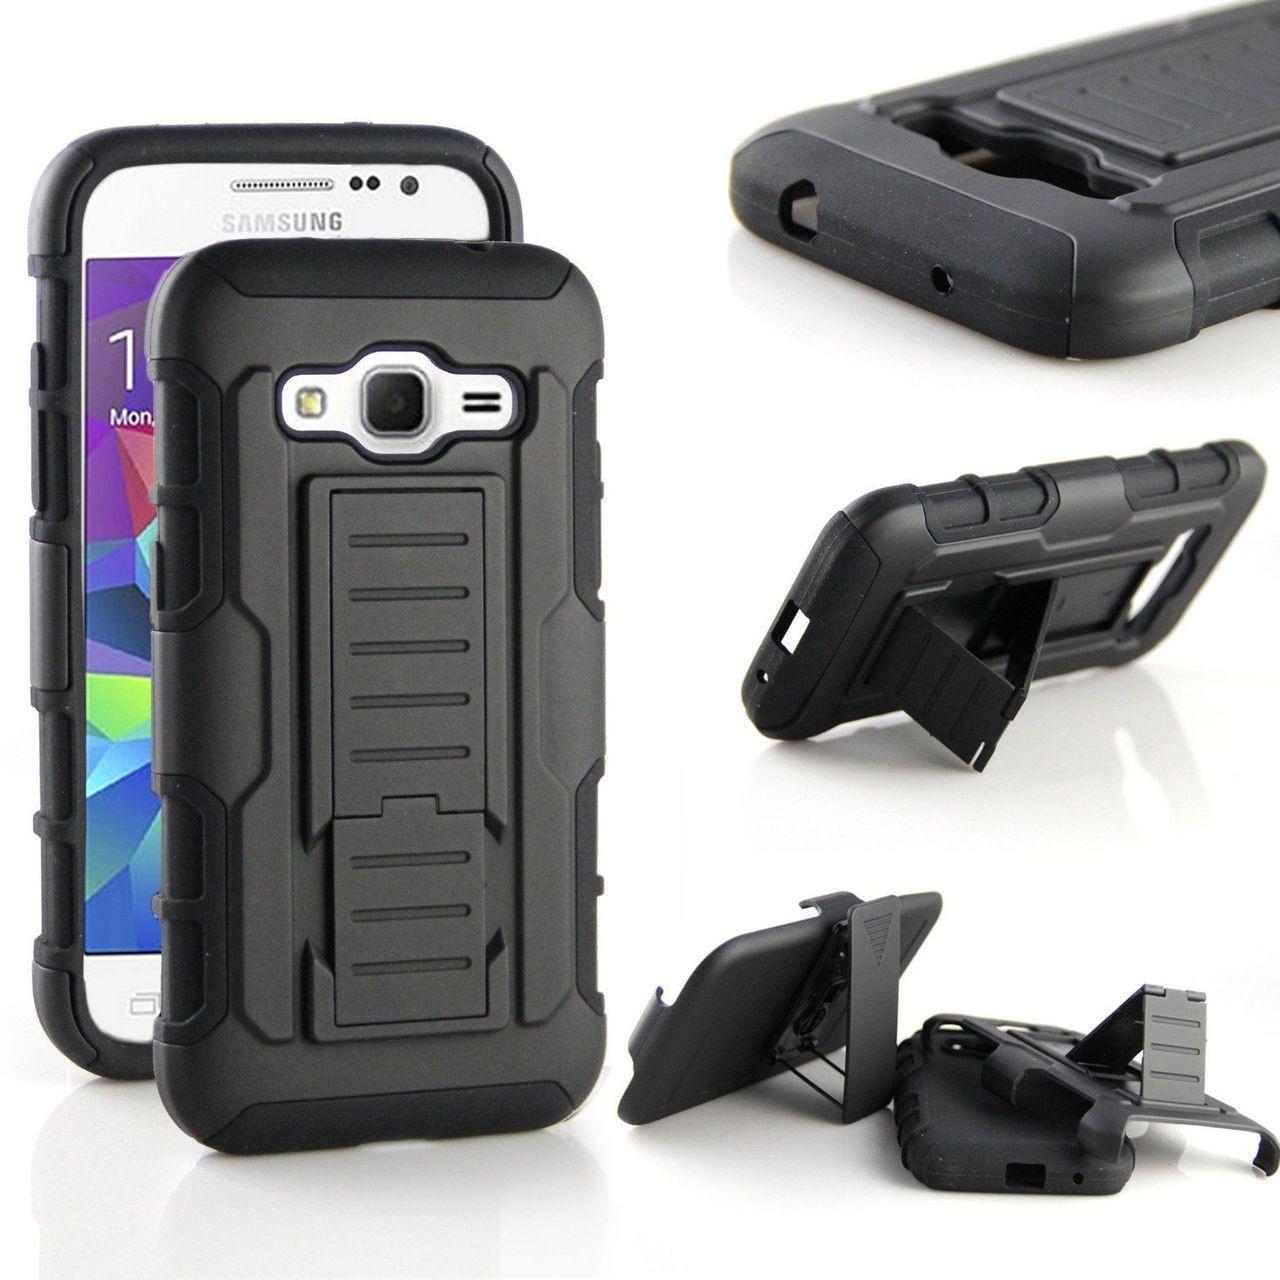 info for b9309 35db5 Samsung Galaxy S4 Shockproof Heavy Duty Case Cover I9500 I9505 S 4 IV